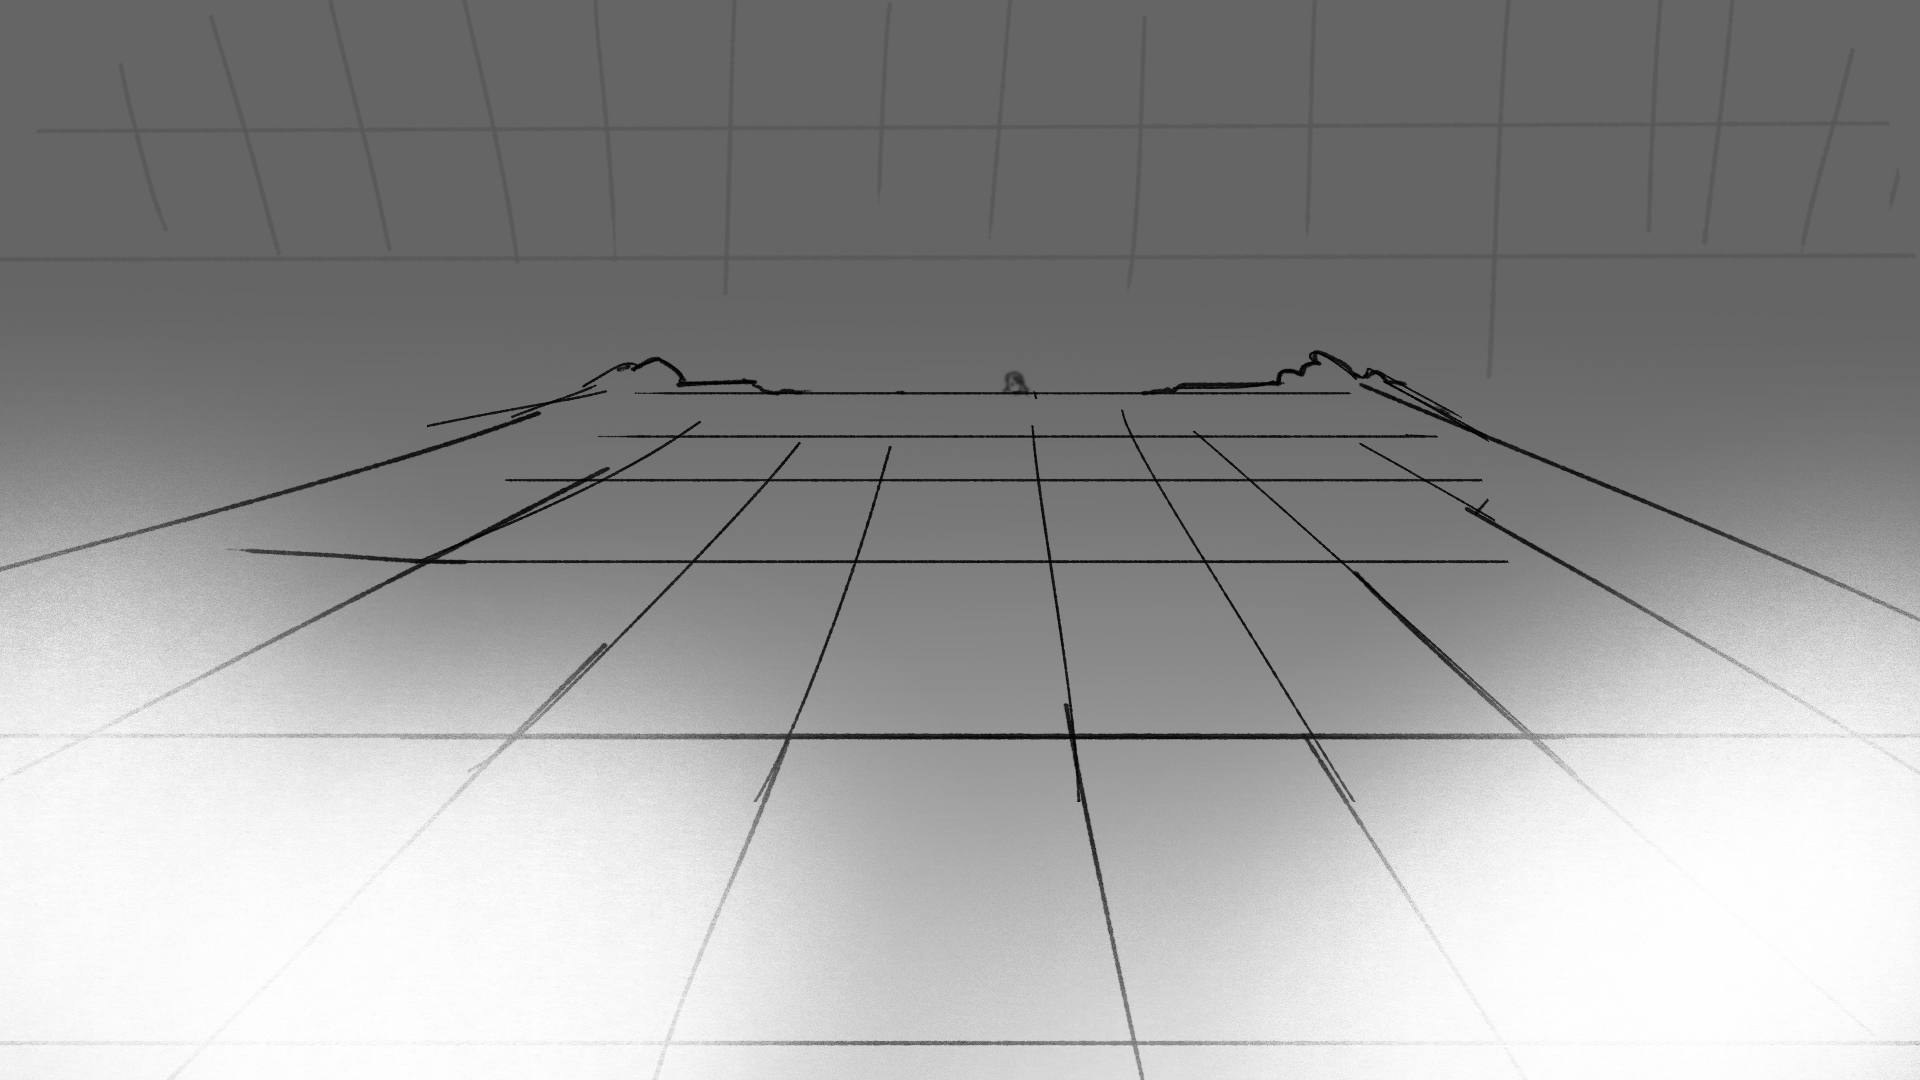 GreatC_Rooftop_061.jpg